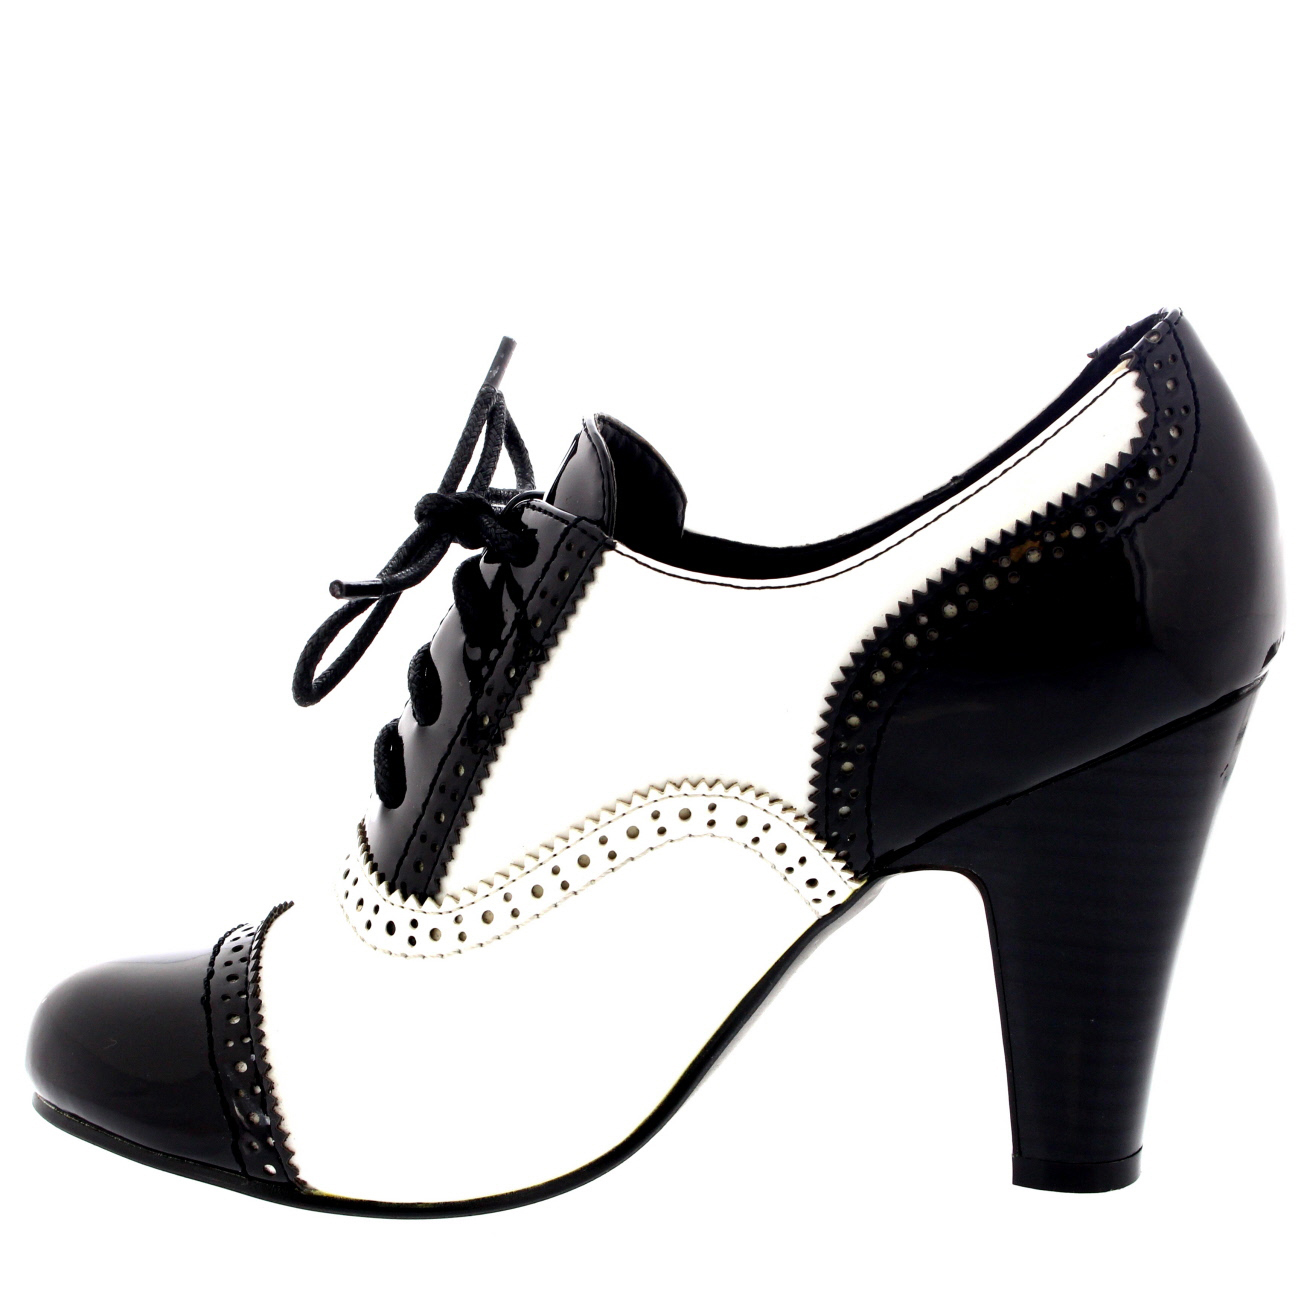 Mary Jane pumps womens-mid-block-heel-lace-up-evening-work- VIMZMYA